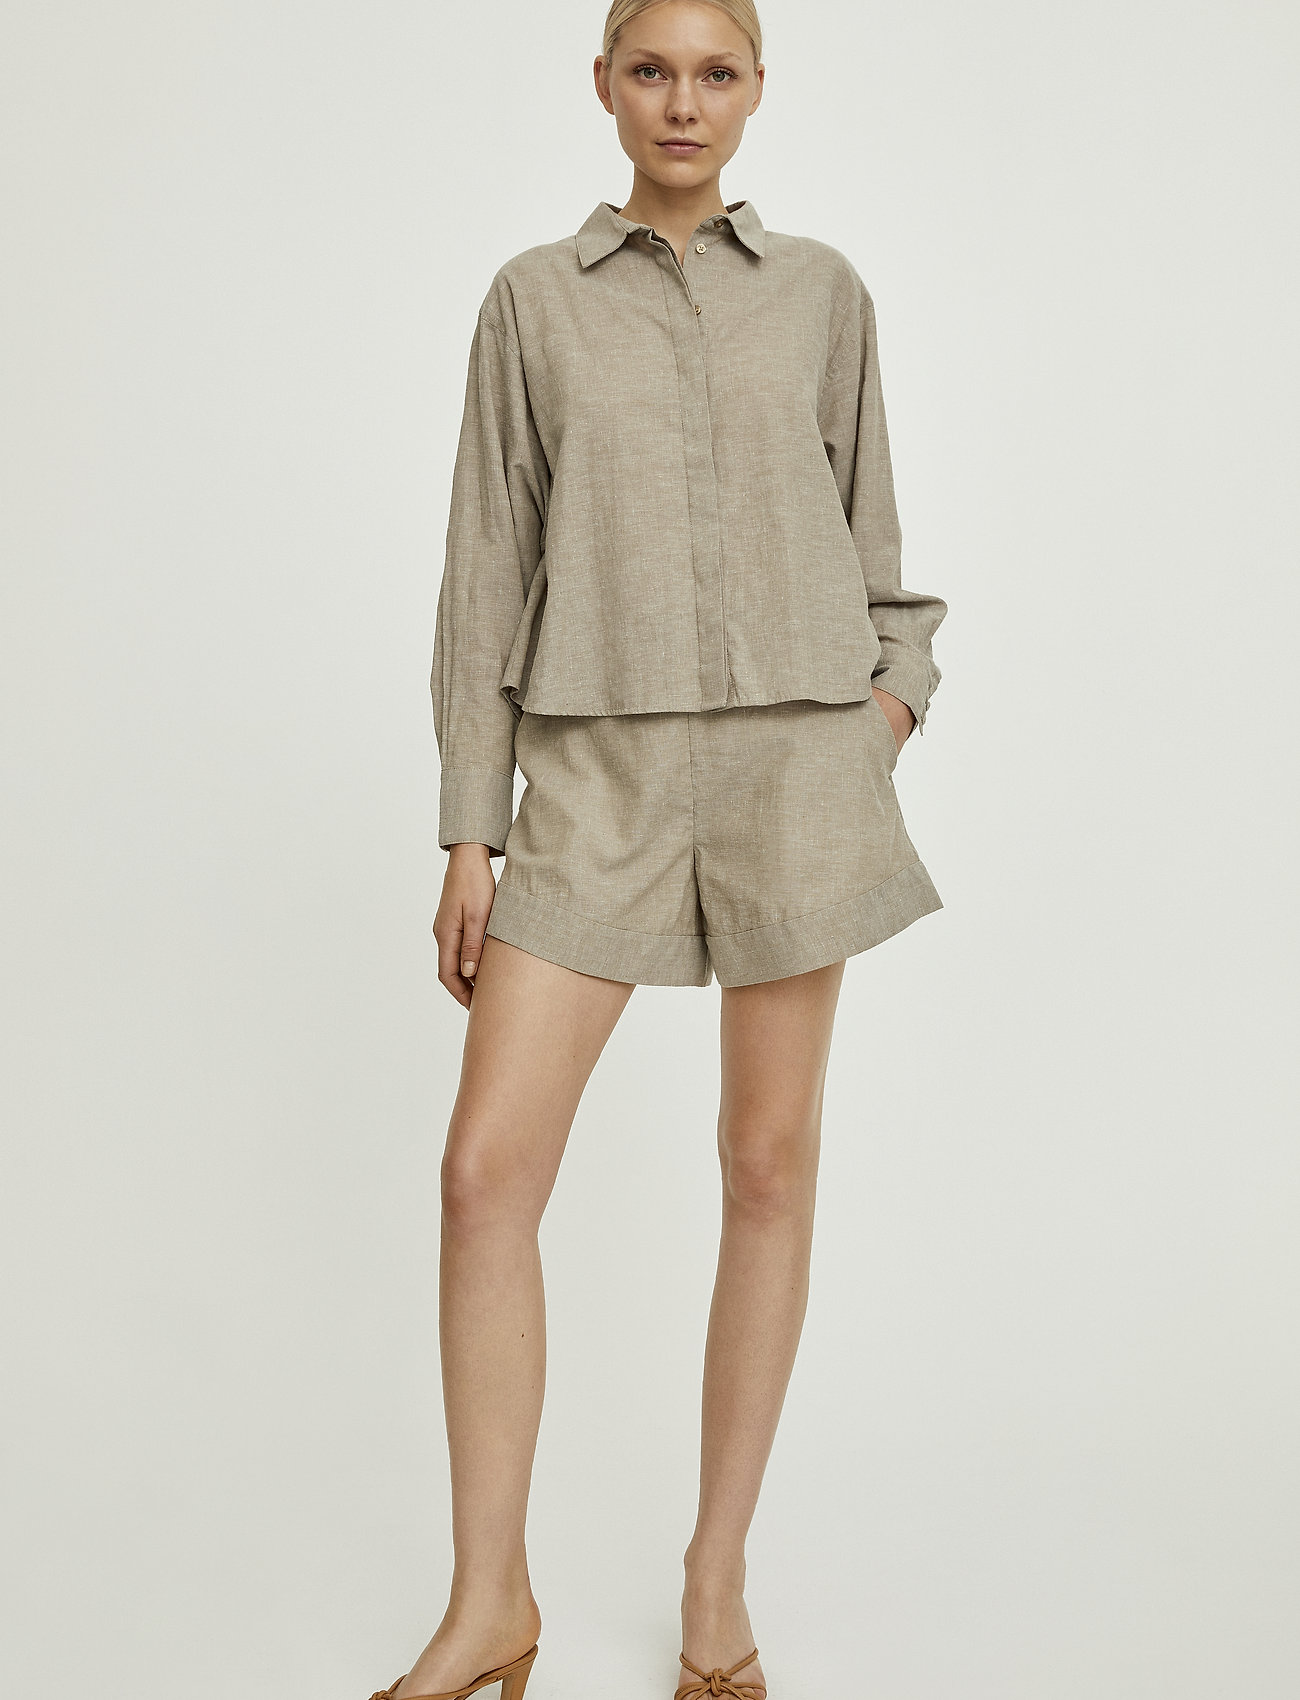 Stylein - BRIONE SHIRT - chemises à manches longues - beige - 0